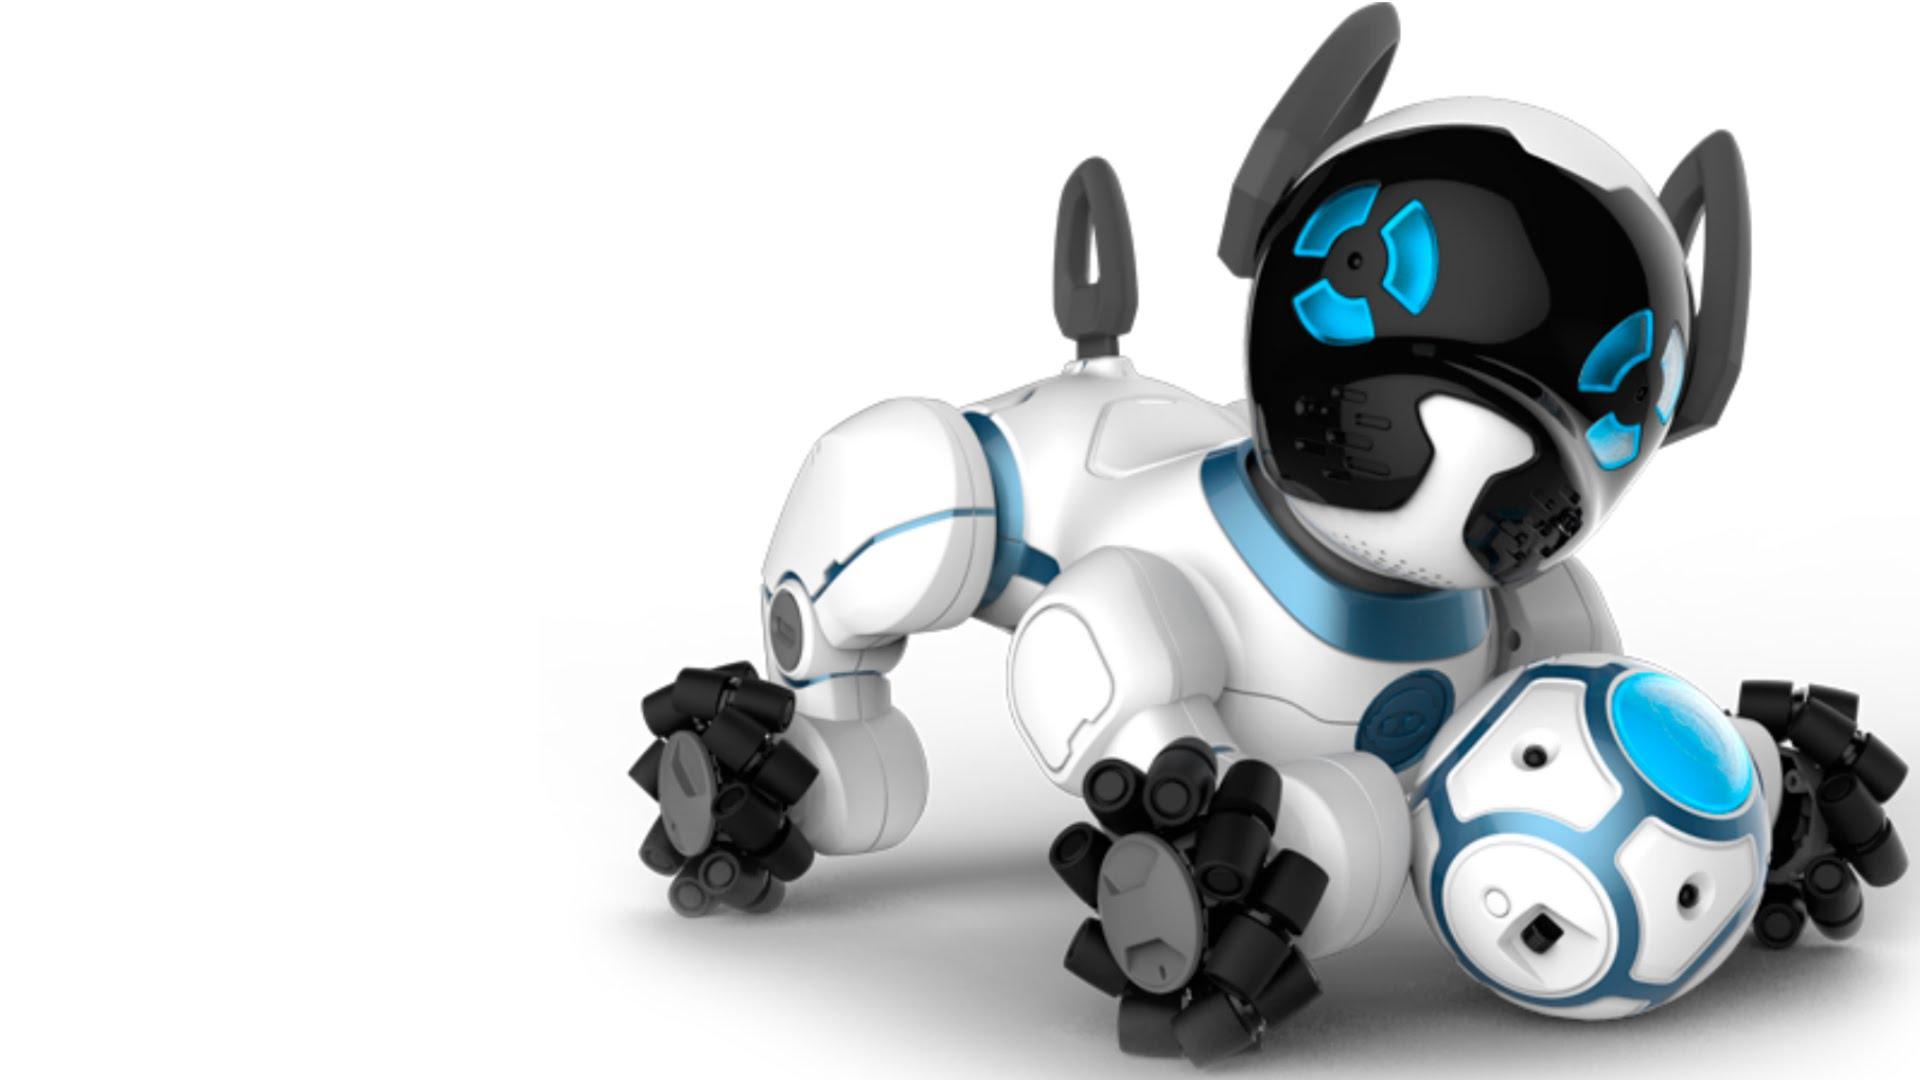 Best Robots For Kids >> Free Photo Robot Kid Hall Light Machine Free Download